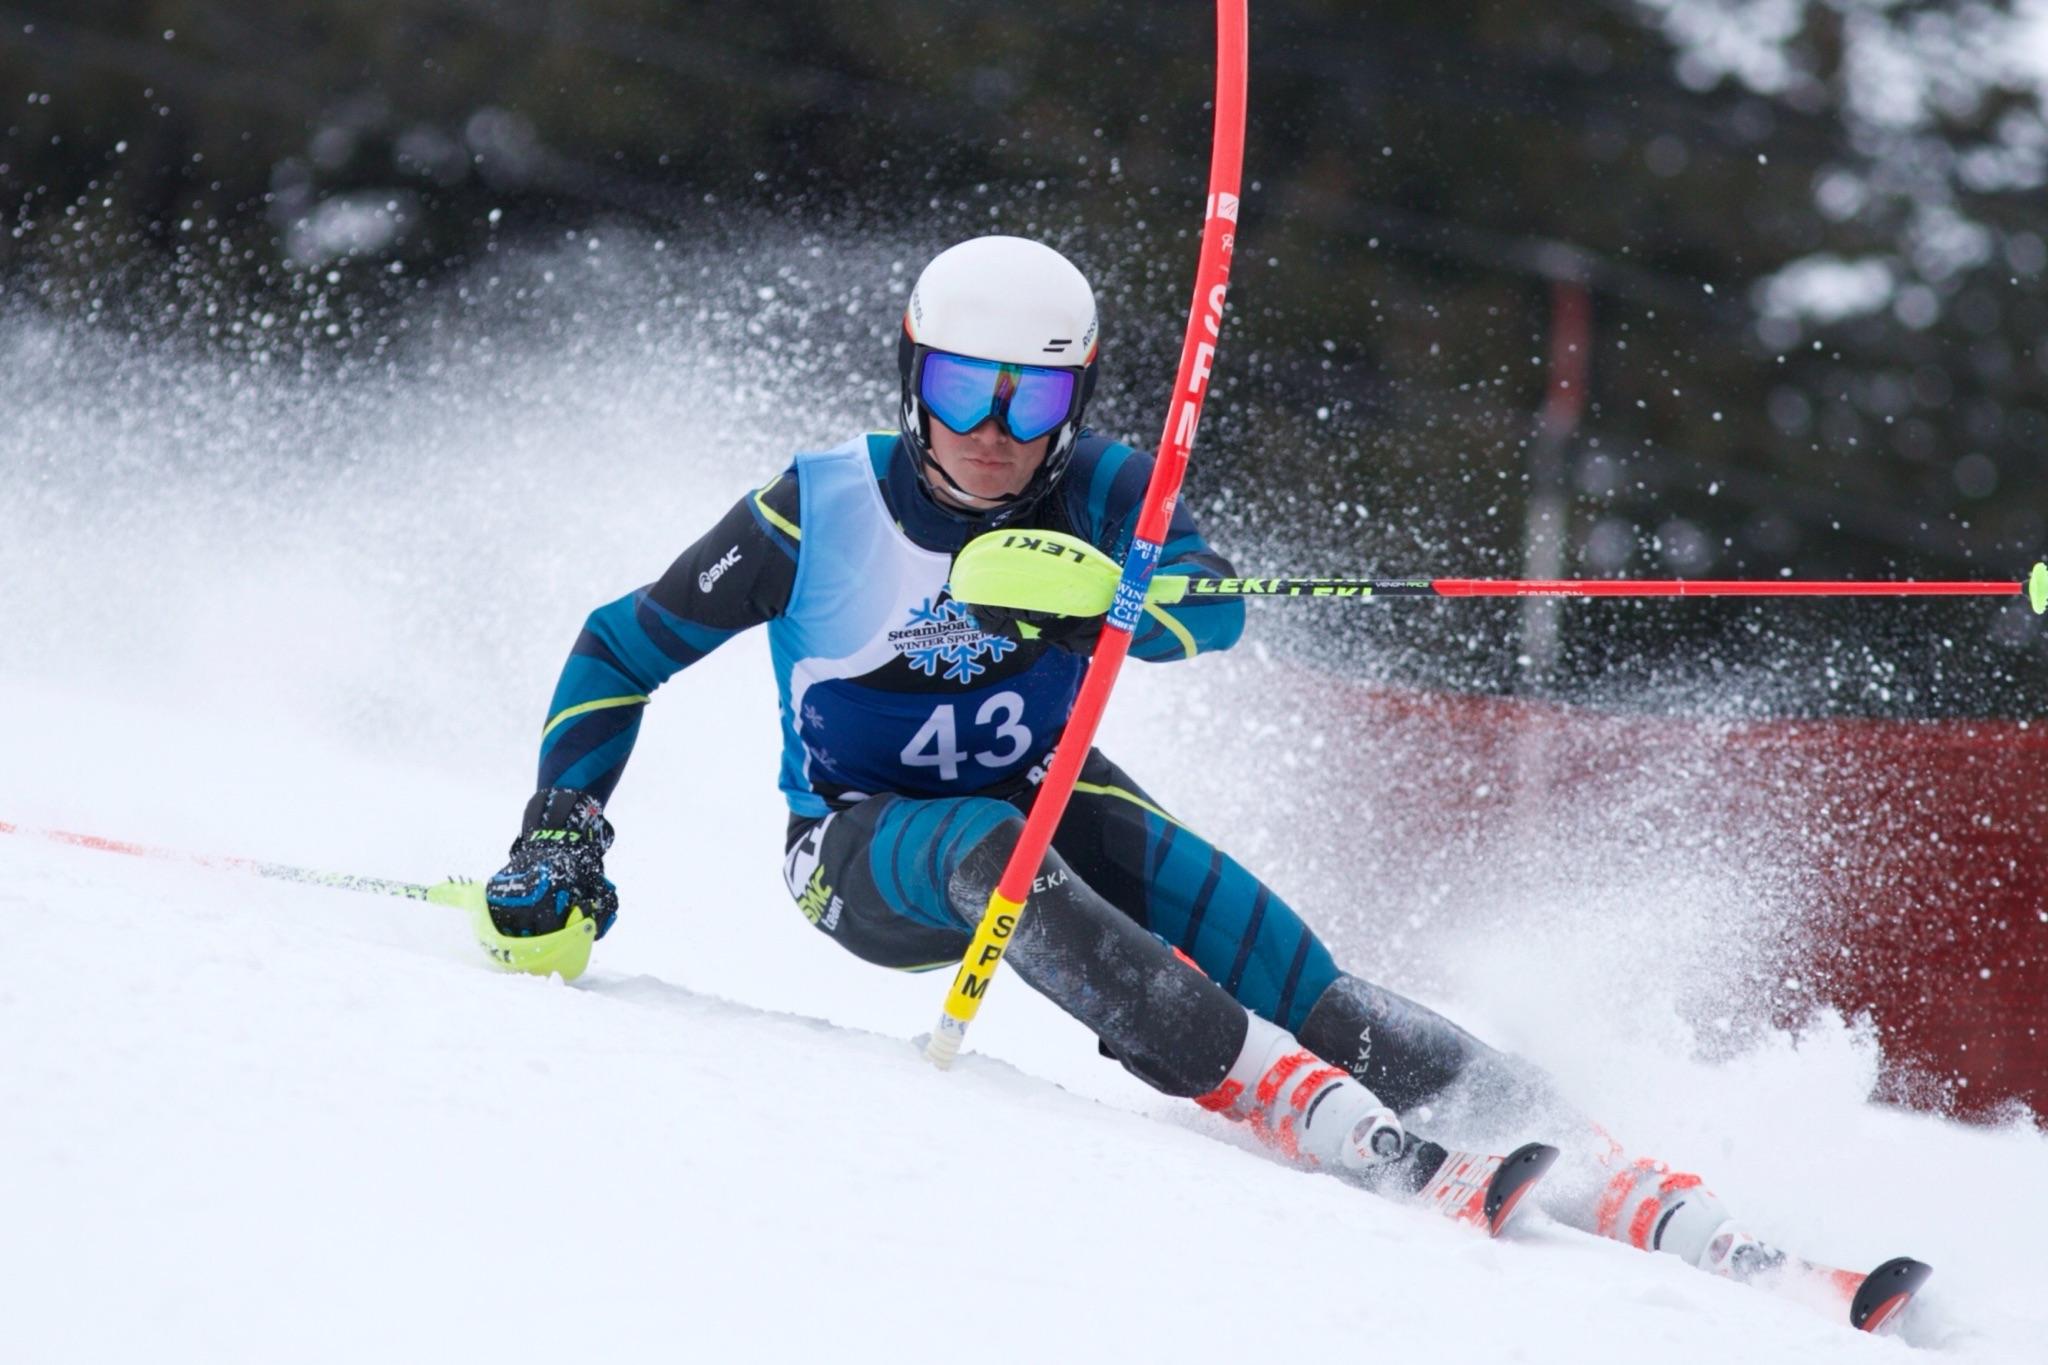 Downhill skiing at buck hill